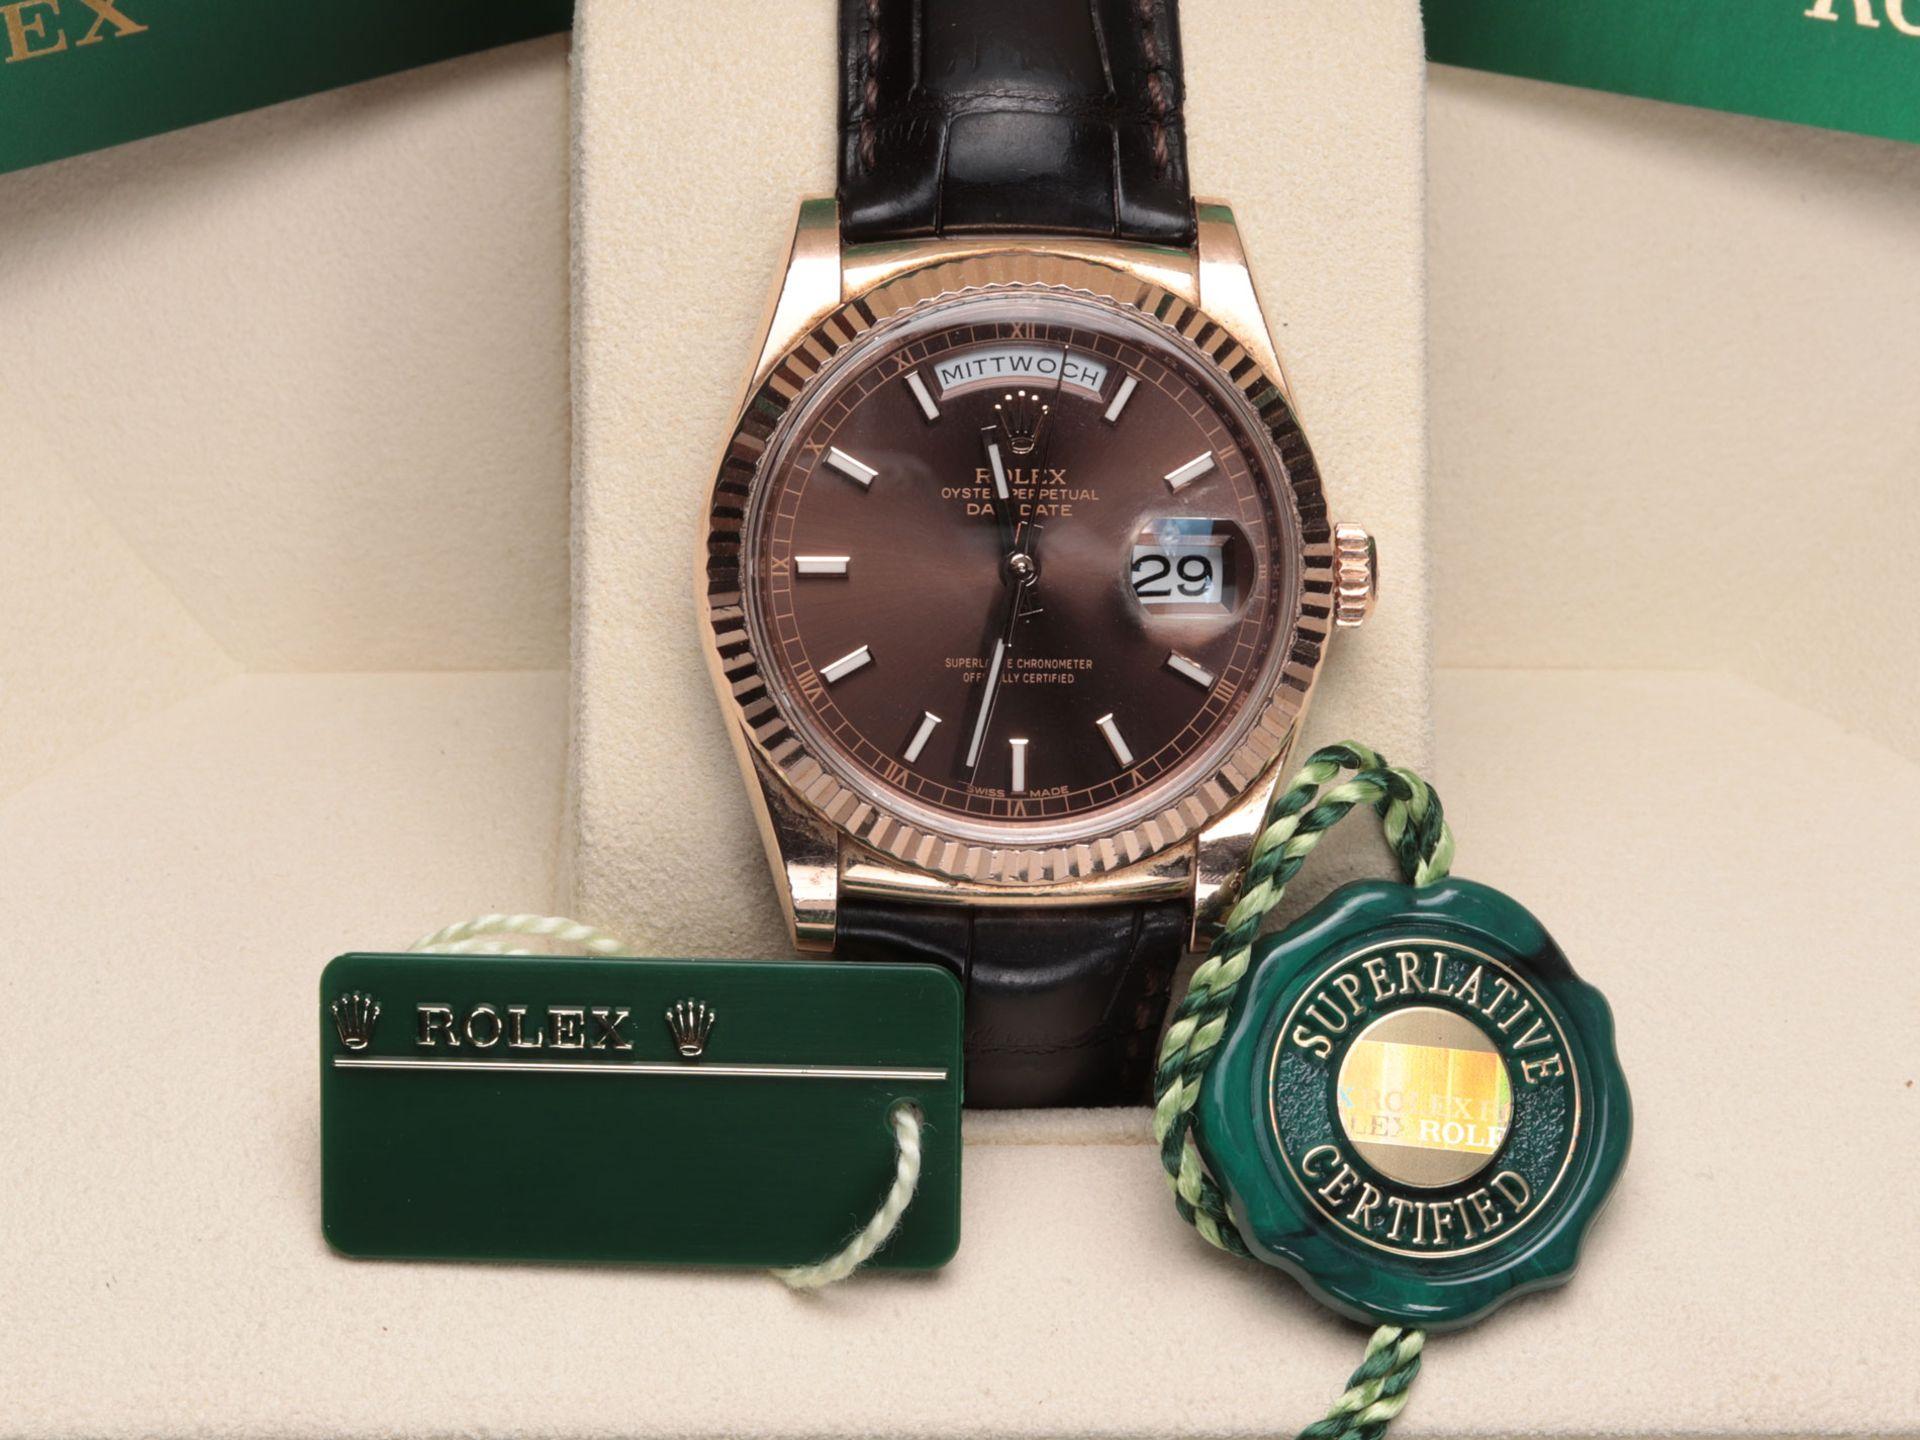 Rolex - Herrenarmbanduhr Roségold 750, Rolex Day-Date Oyster Perpetual, Superlative C - Image 10 of 17